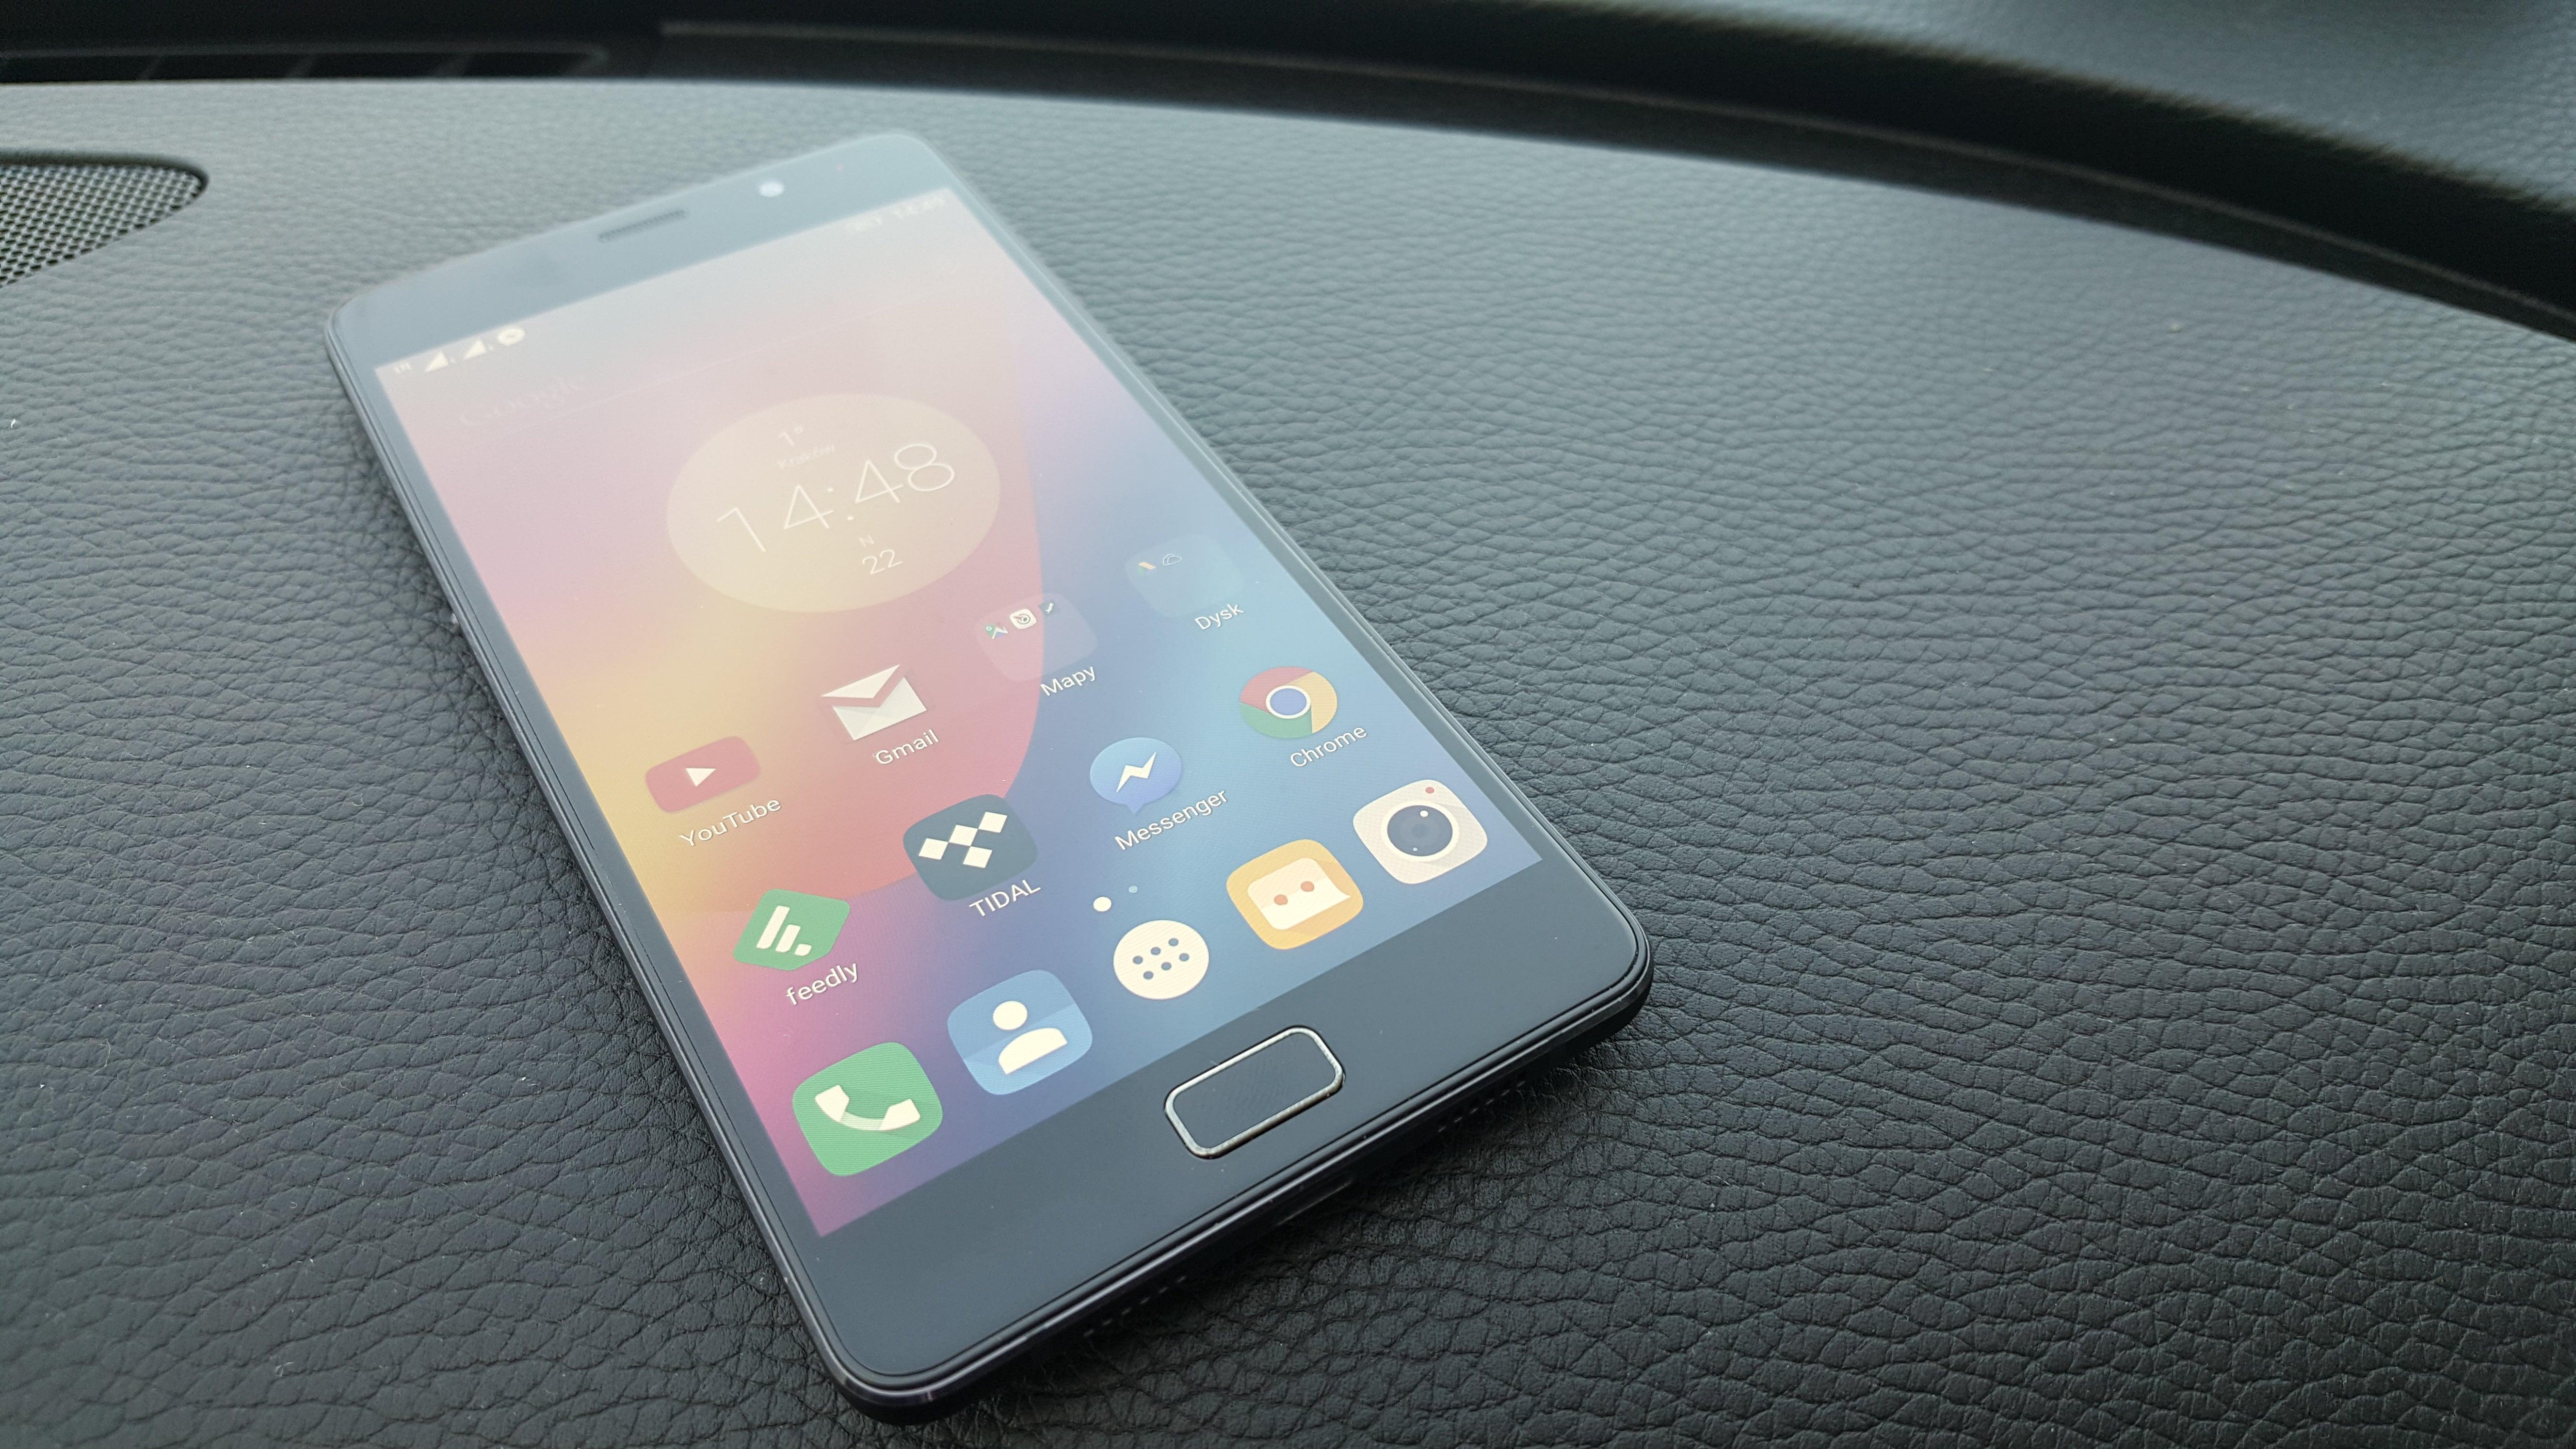 Lenovo P2 otrzymuje właśnie Androida 7.0 Nougat